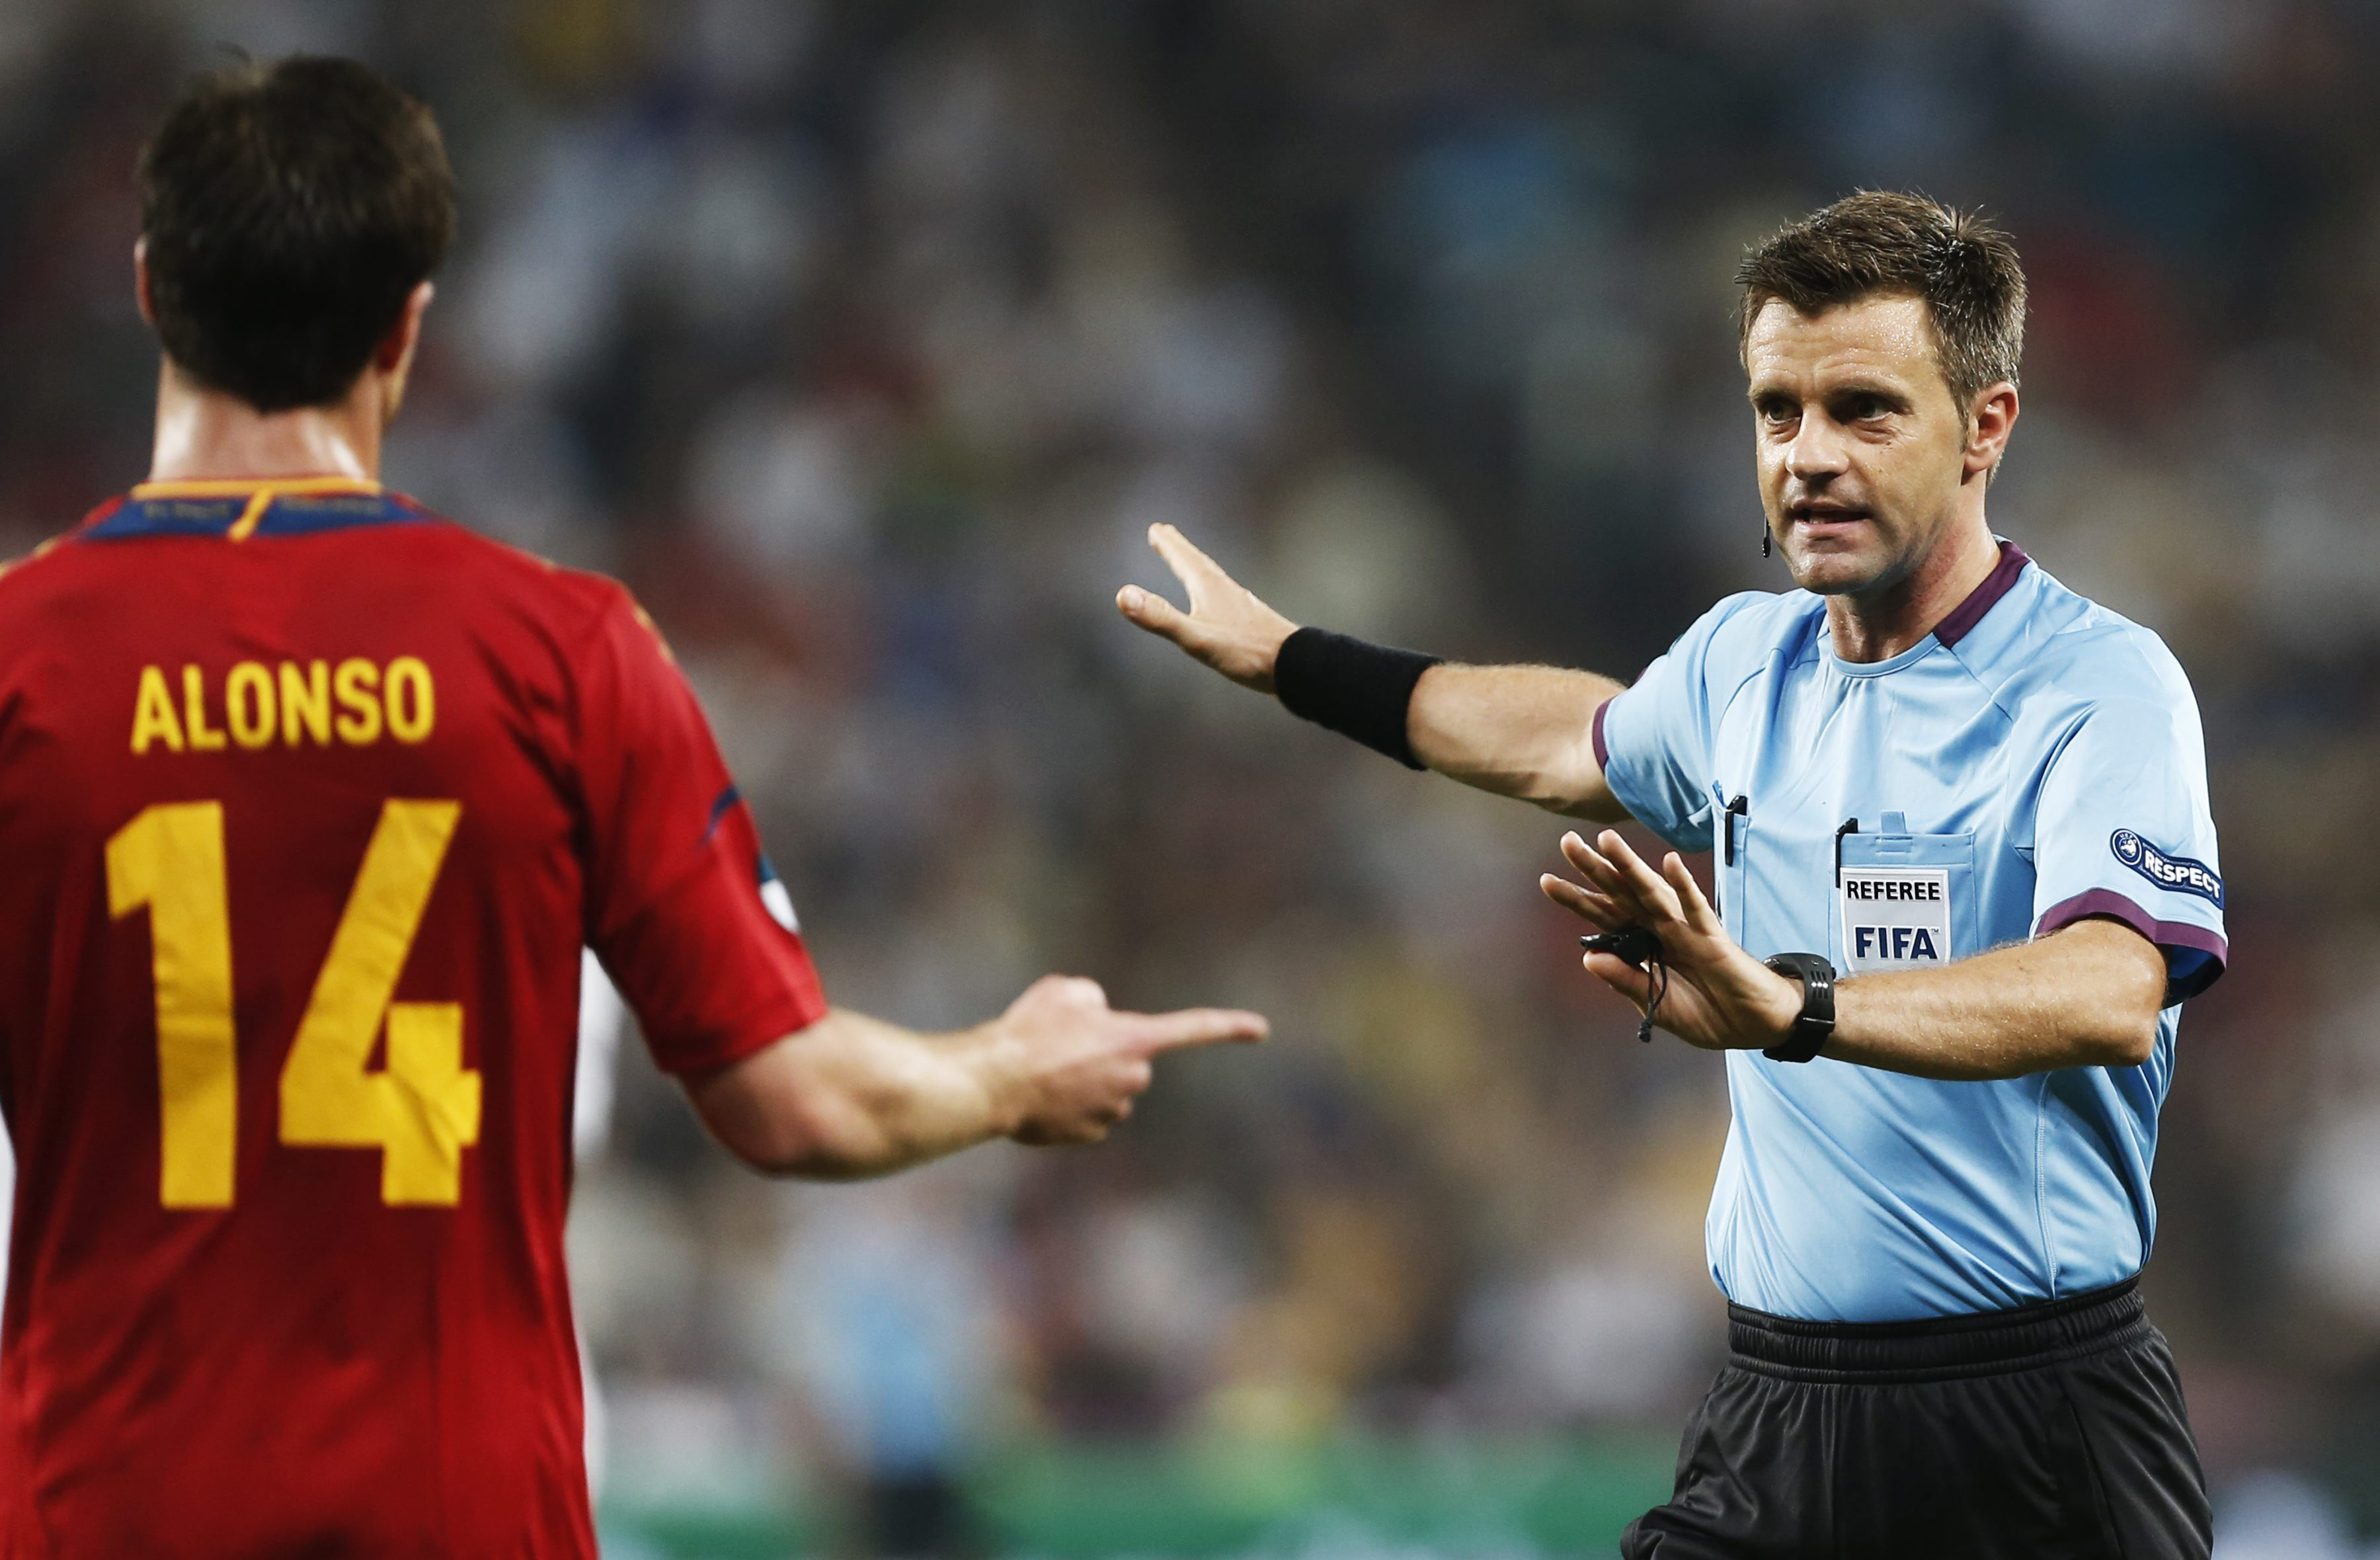 El italiano Rizzoli, árbitro de la final